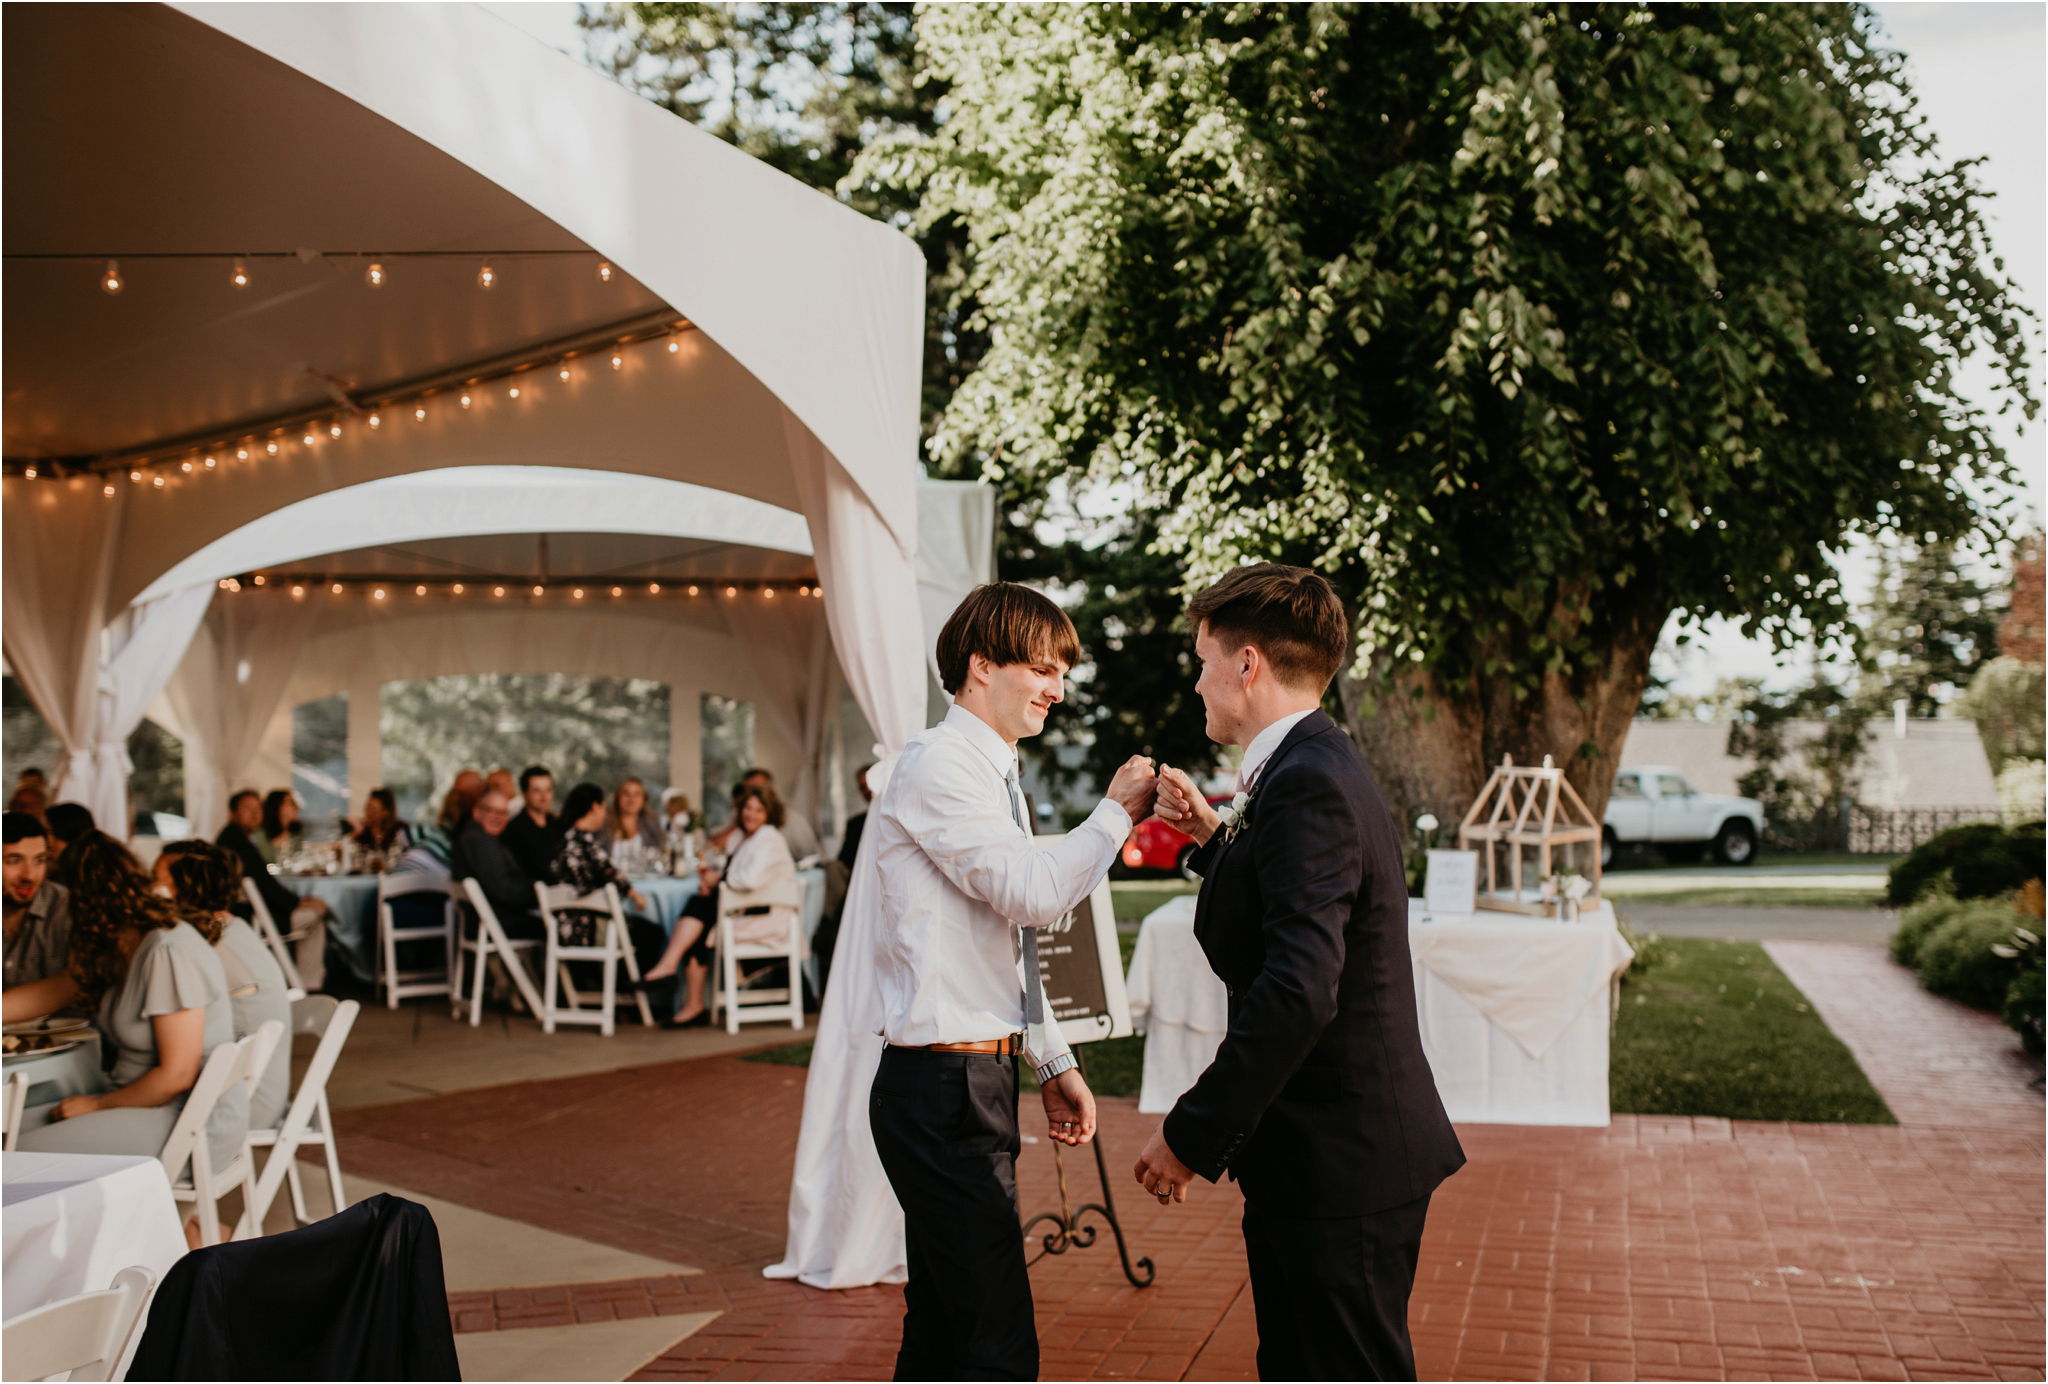 chance-and-ondrea-lairmont-manor-wedding-seattle-photographer-098.jpg